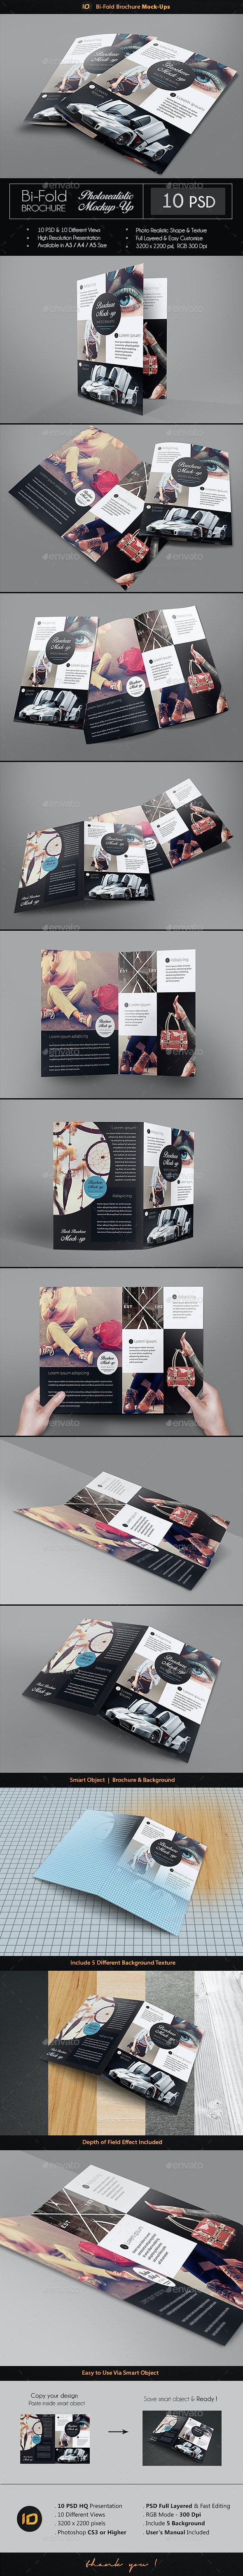 Realistic Bi-Fold Brochure Mock-Up - Brochures Print